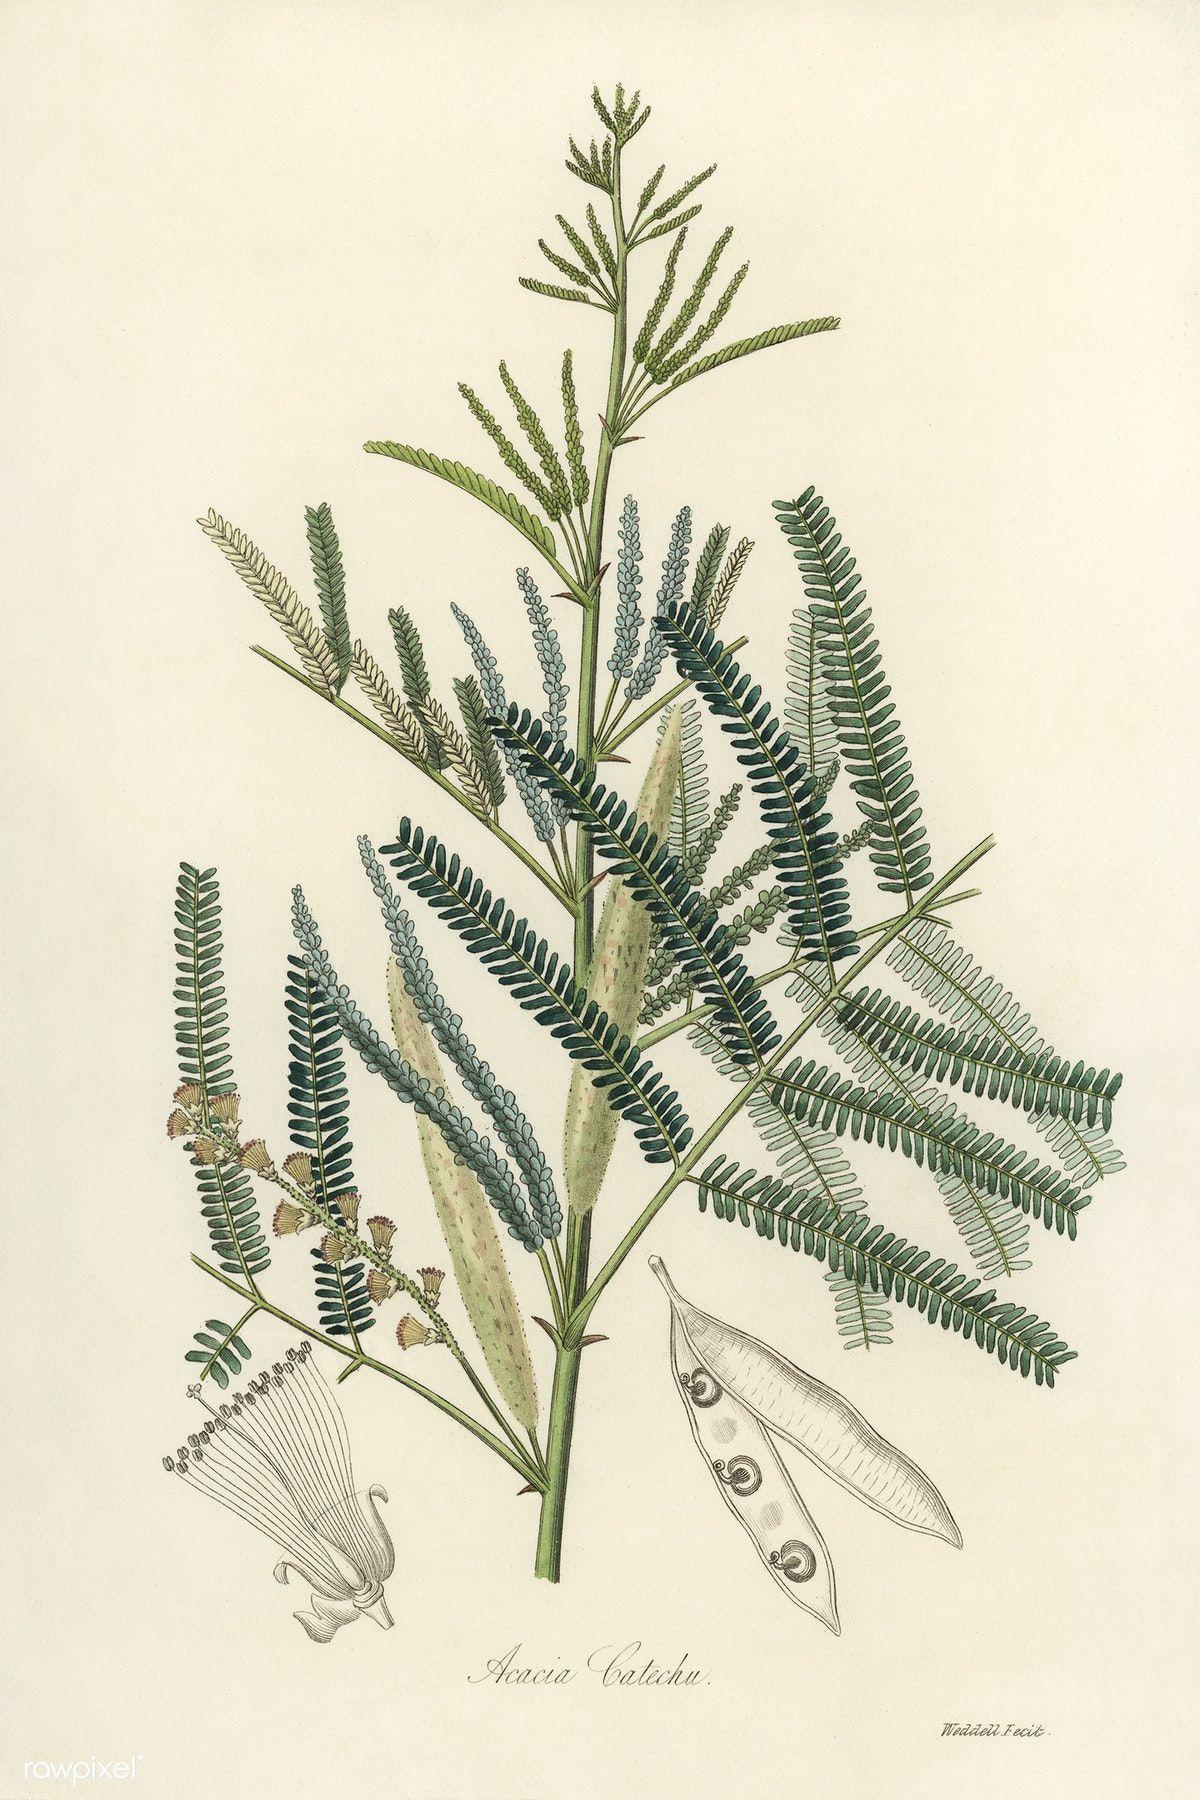 Mimosa Catechu Acacia Catechu Illustration From Medical Botany 1836 By John Stephenson And James Morss Antique Illustration Illustration Free Illustrations